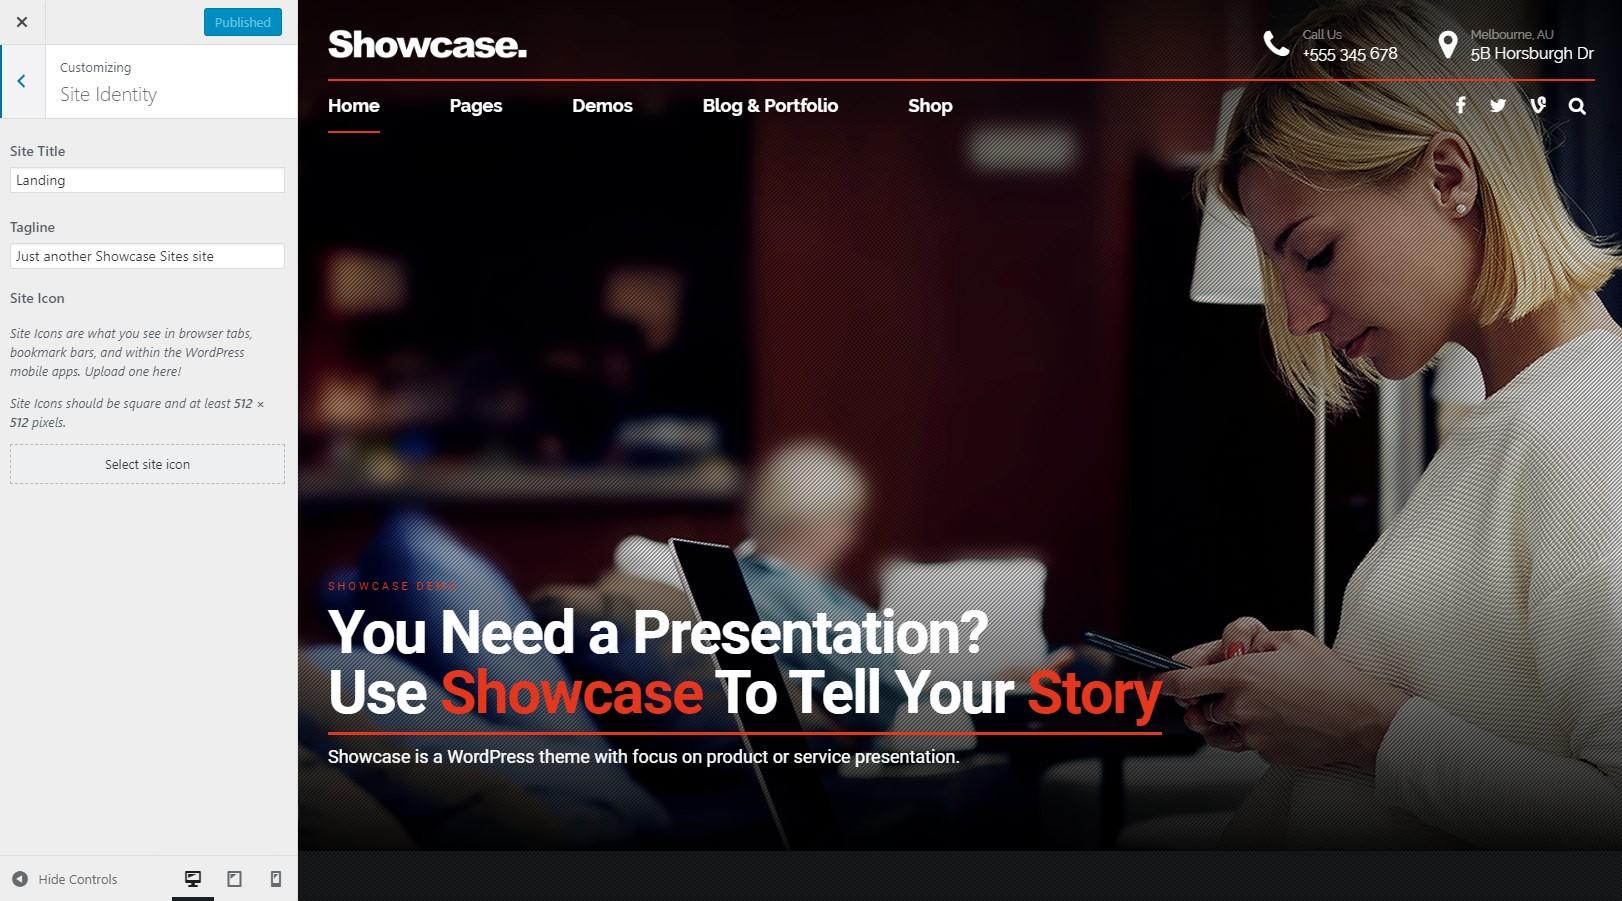 https://documentation.bold-themes.com/showcase/wp-content/uploads/sites/46/2019/09/site-identity.jpg